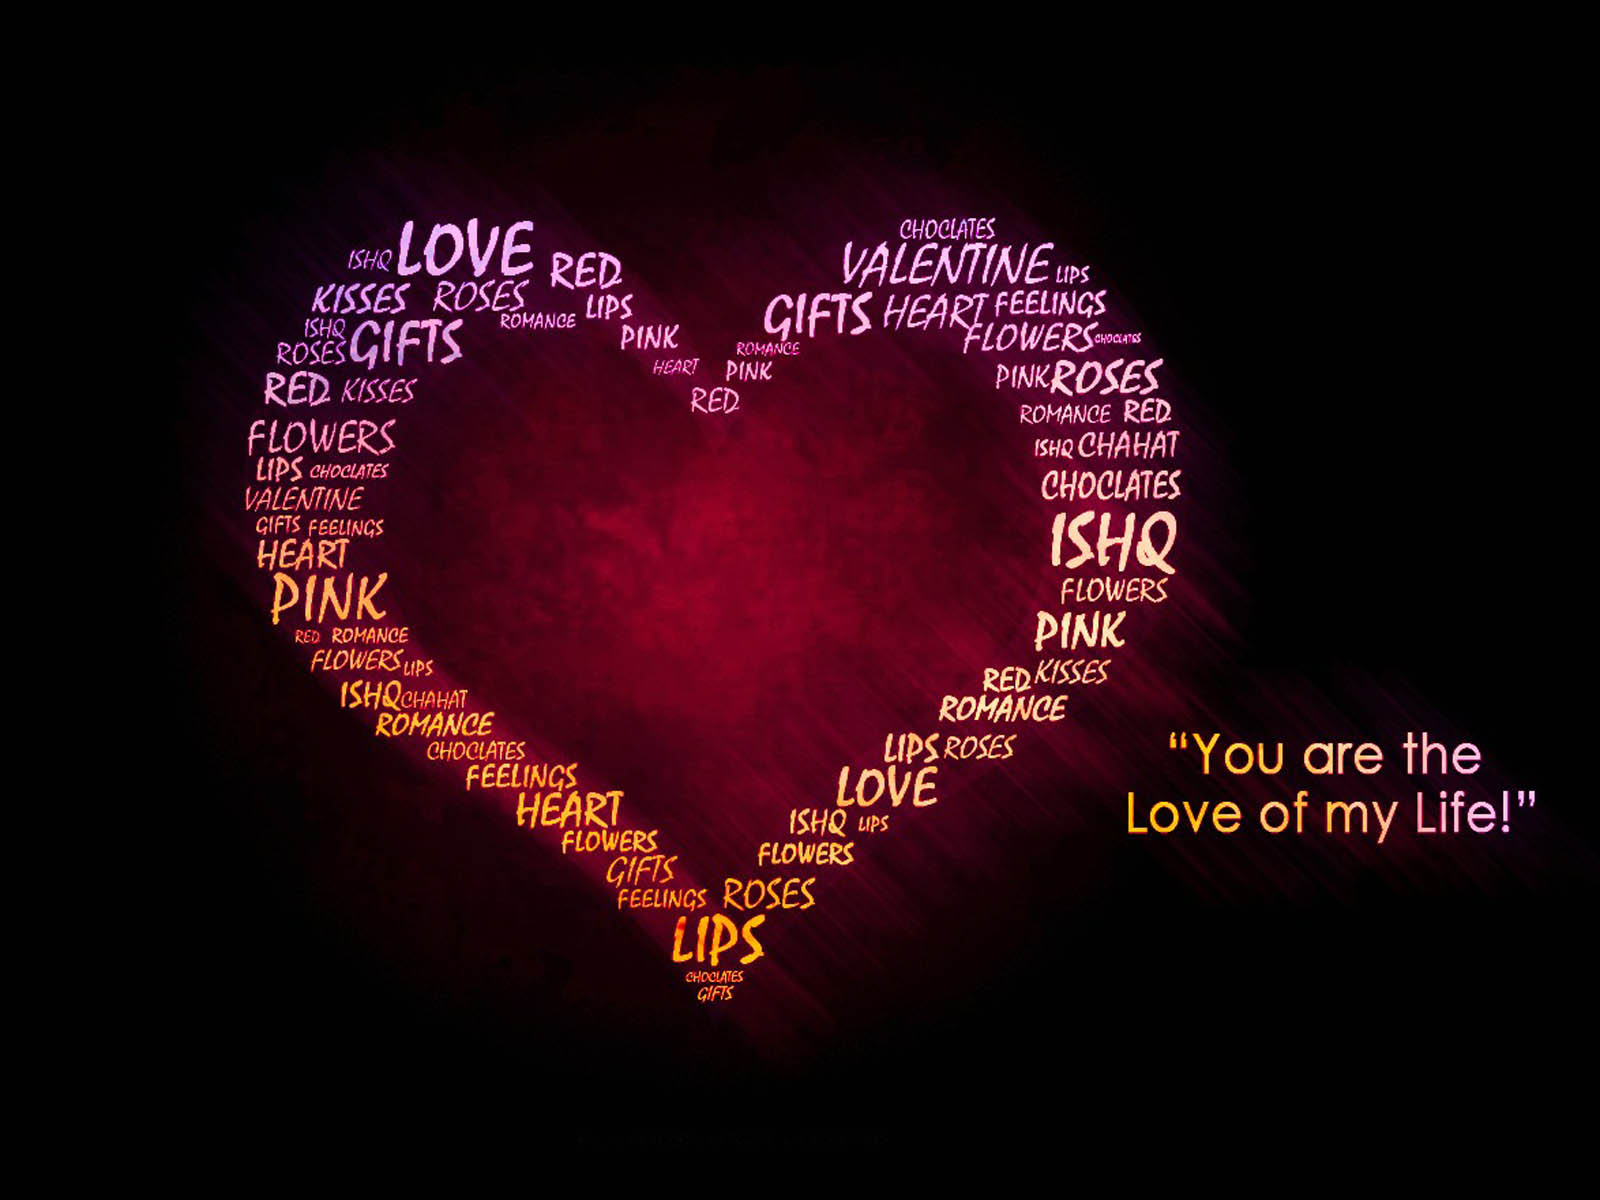 Wallpaper Love Quotes | Free Download Wallpaper | DaWallpaperz